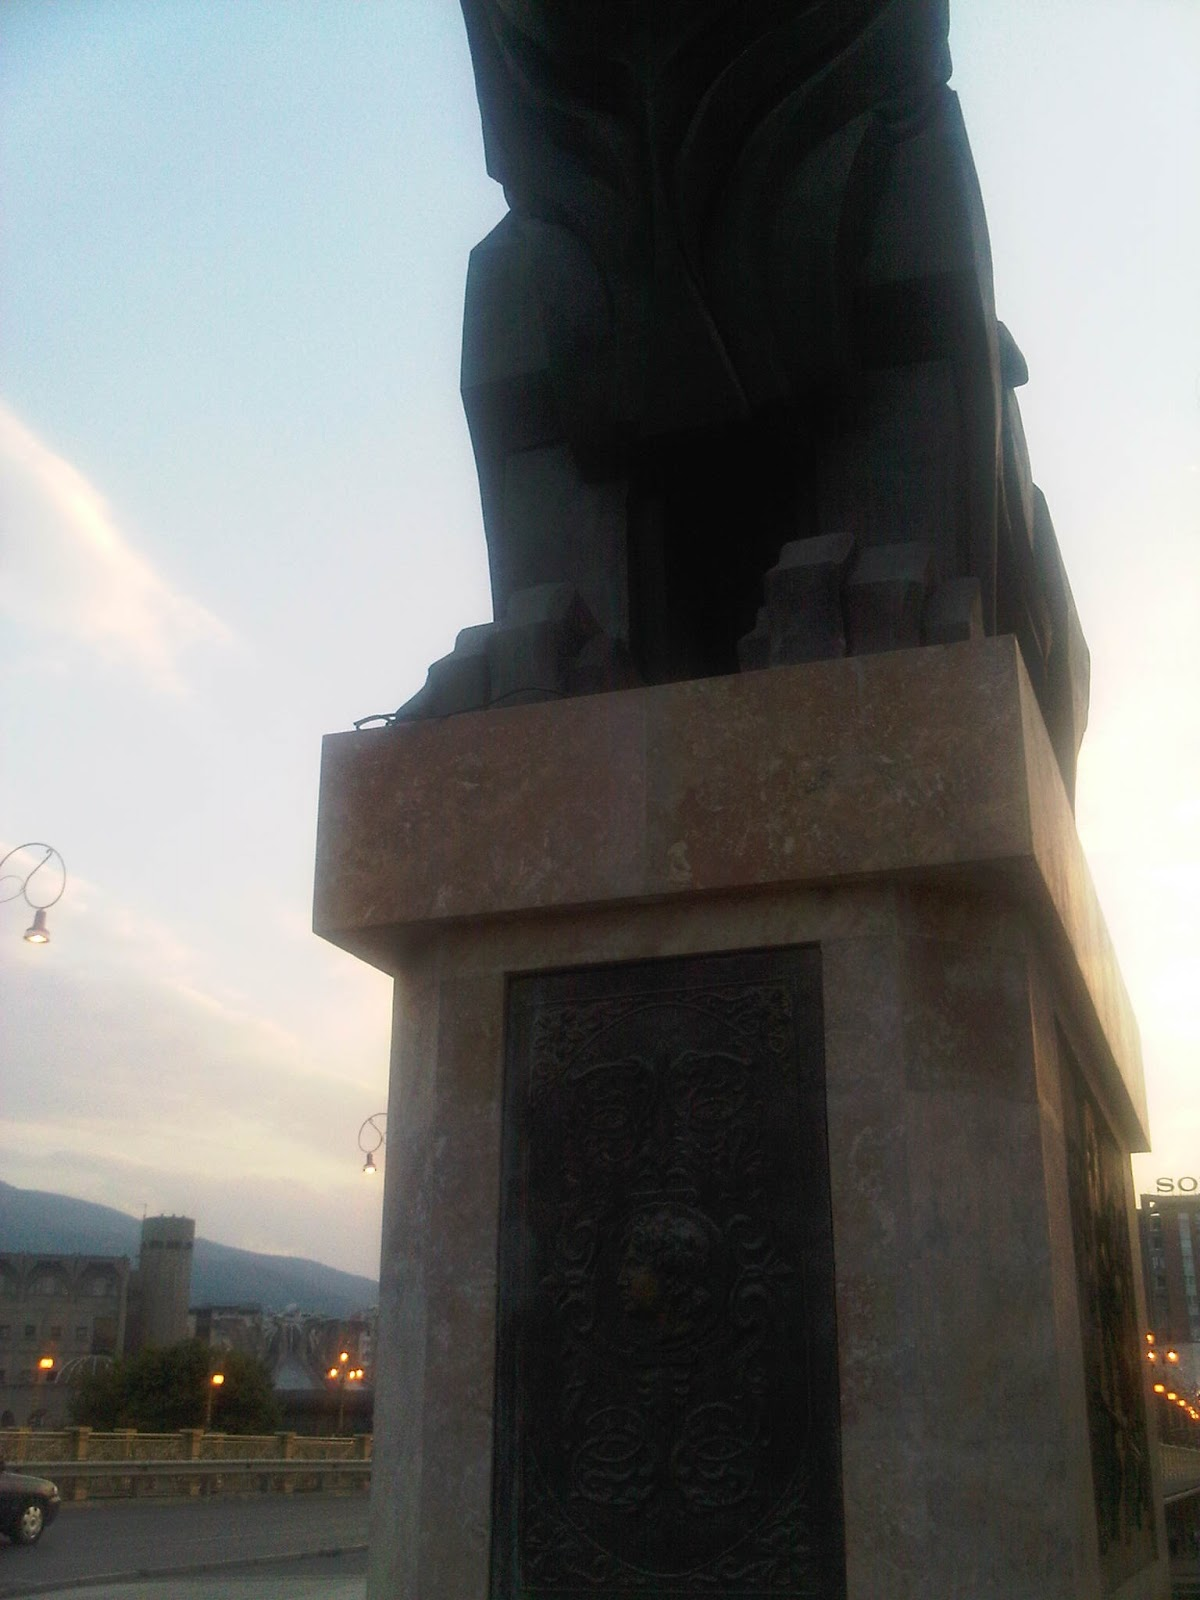 Skopje 20120814 03013 Οι Σκοπιανοί έχουν ανεγείρει μνημείο με τον Αριστοτέλη να διδάσκει τον Μ. Αλέξανδρο... Σλαβικά!!!